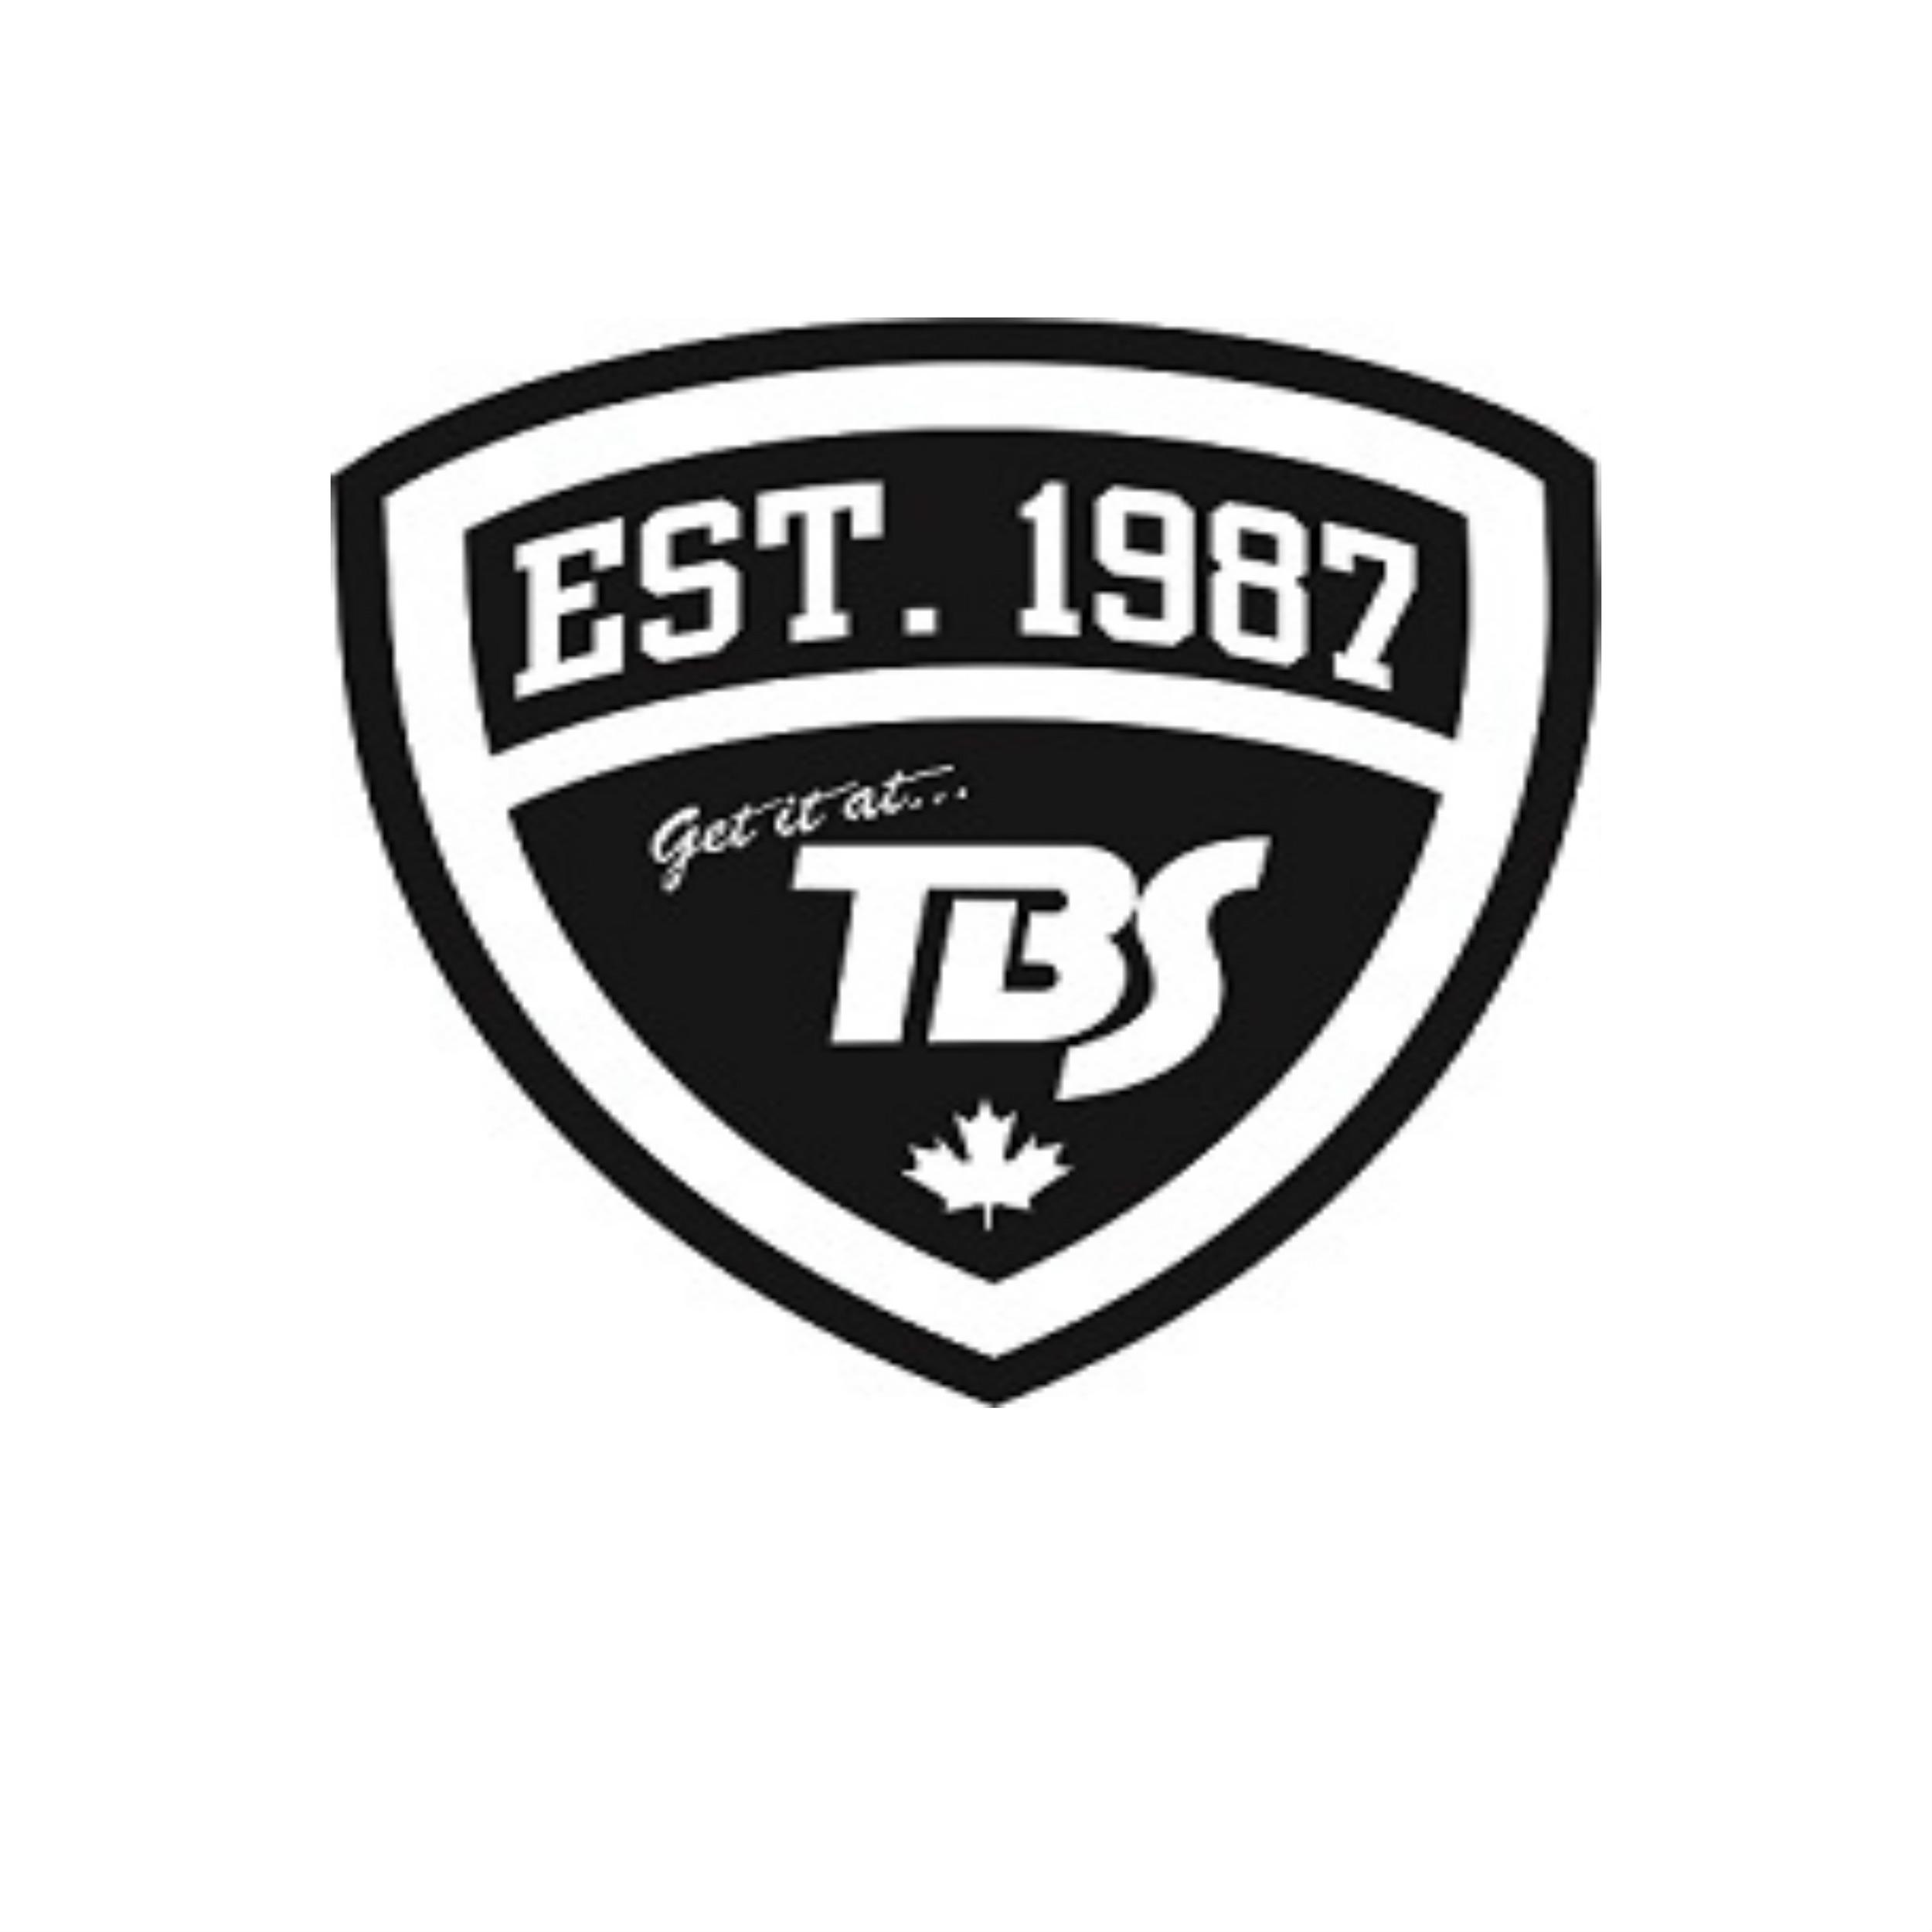 peewee b2 jersey sponsor